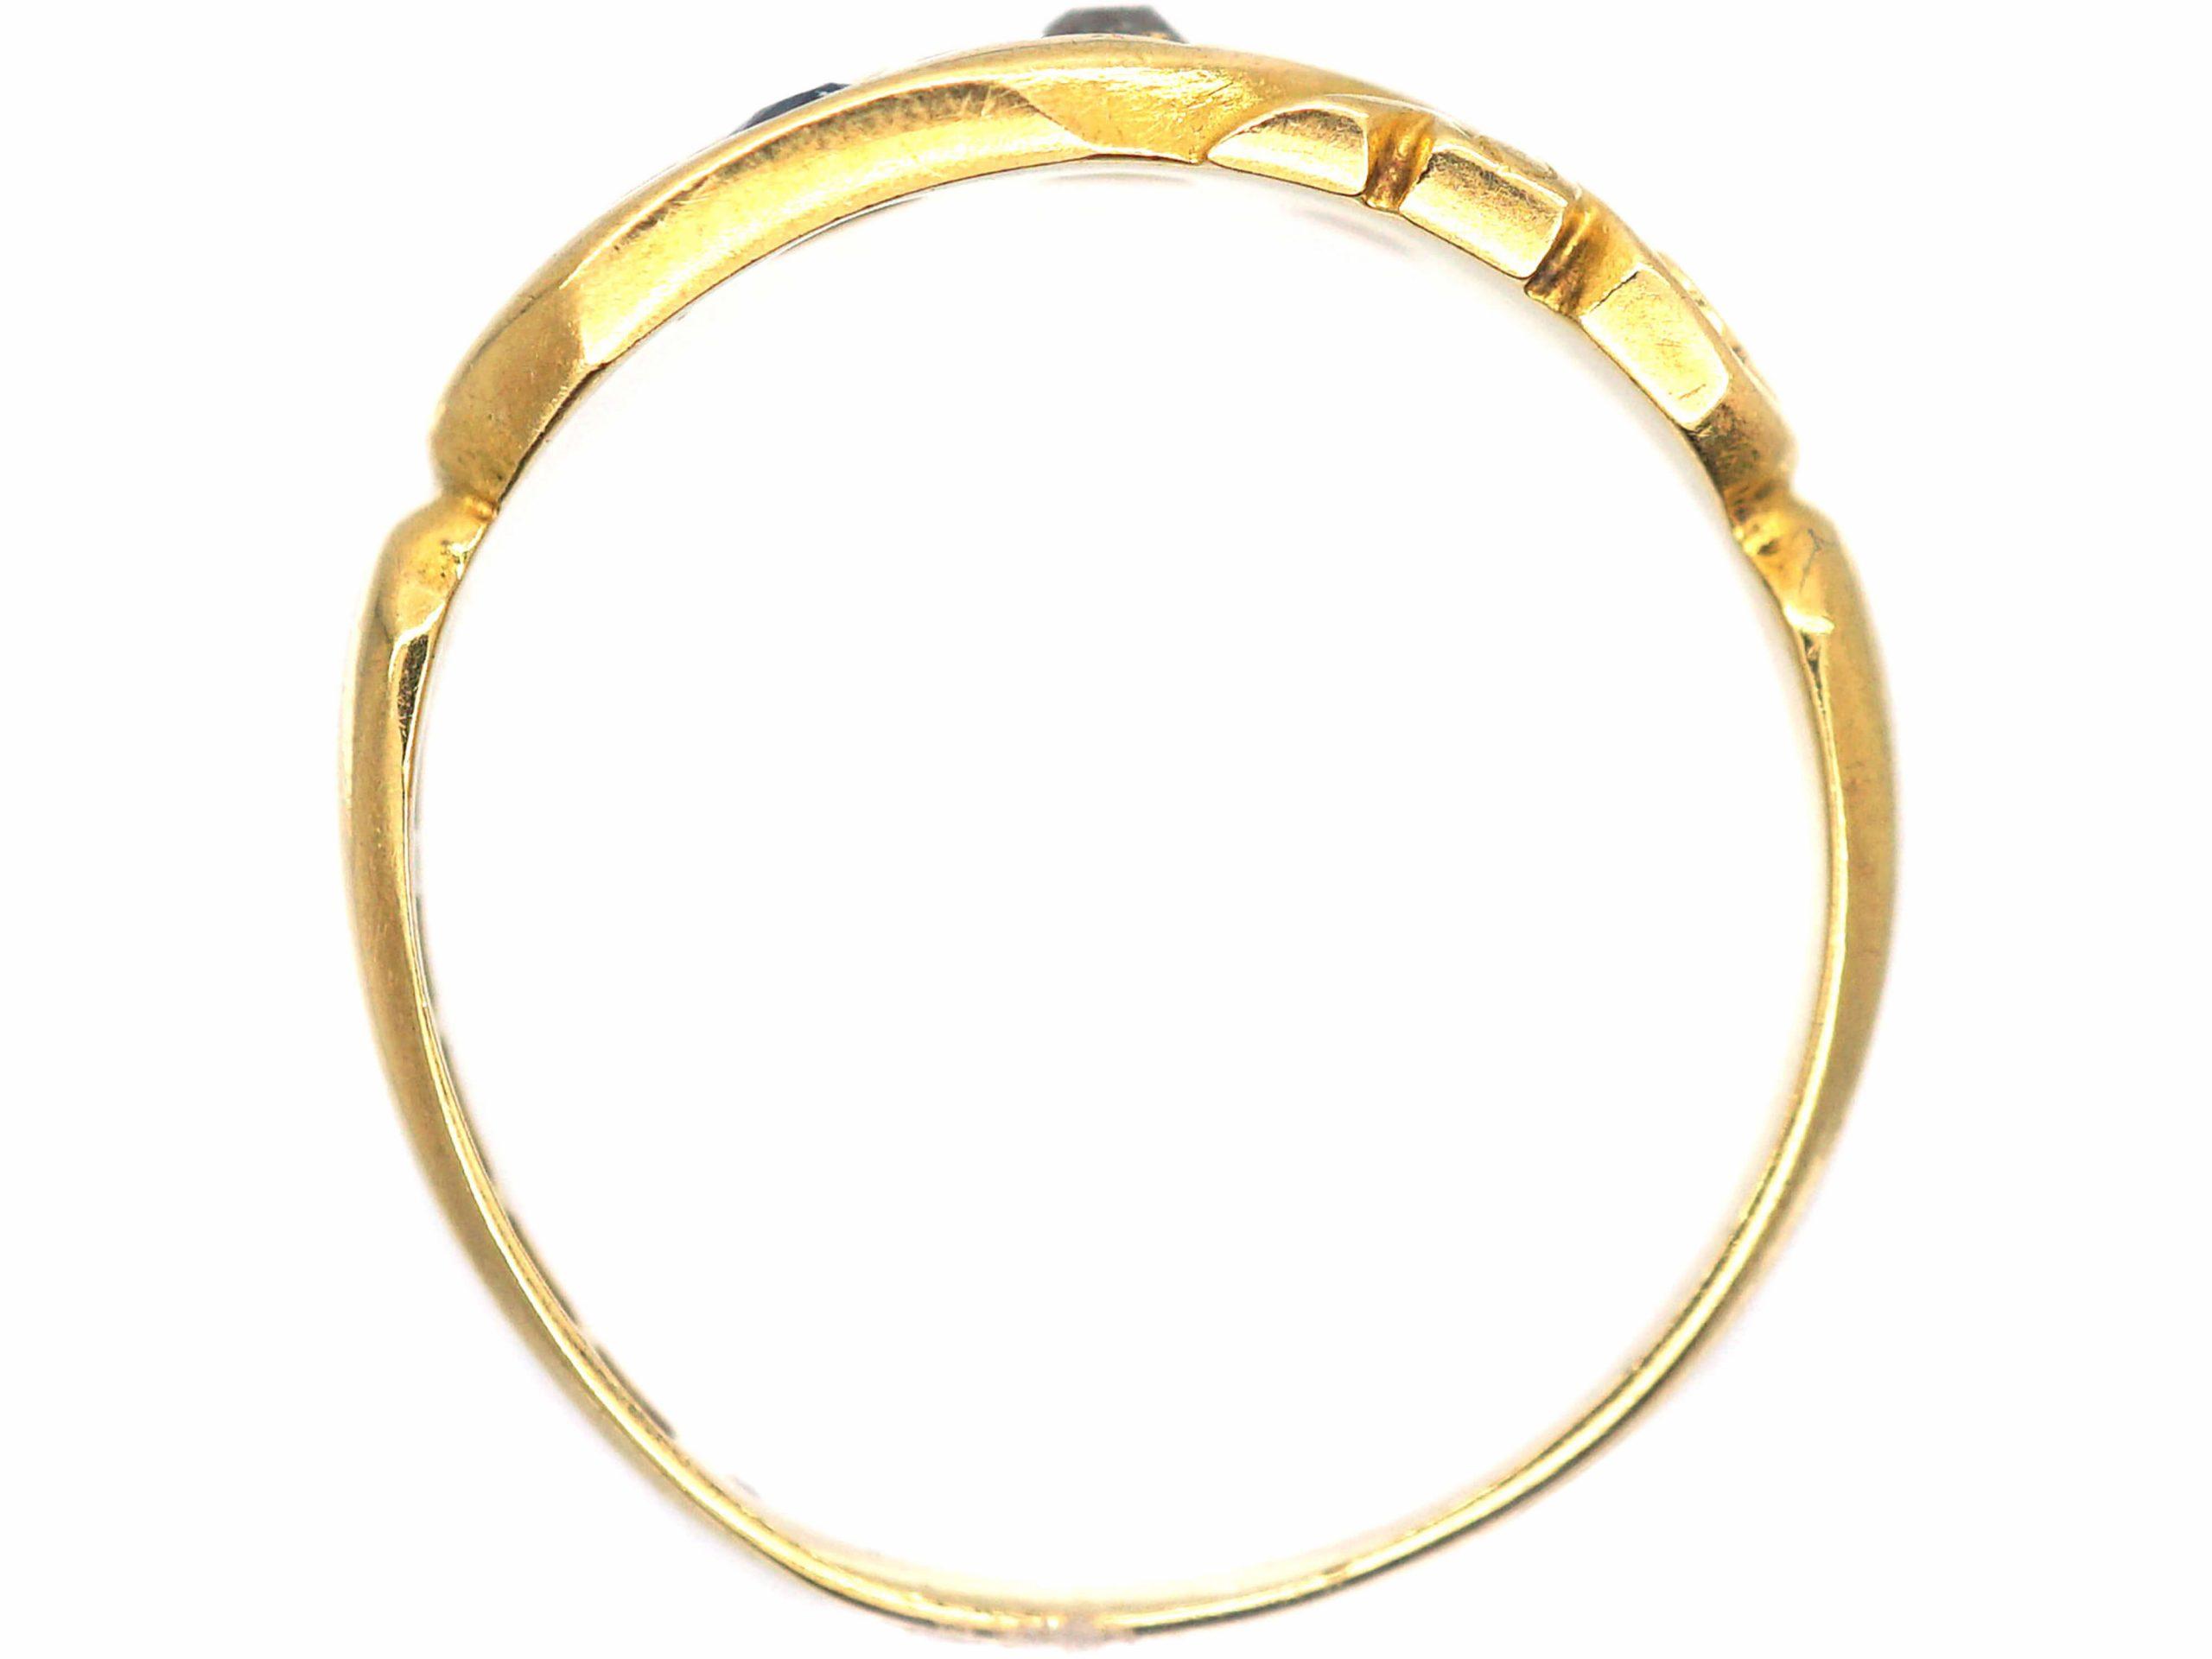 Edwardian 18ct Gold, Sapphire & Diamond Scroll Design Ring